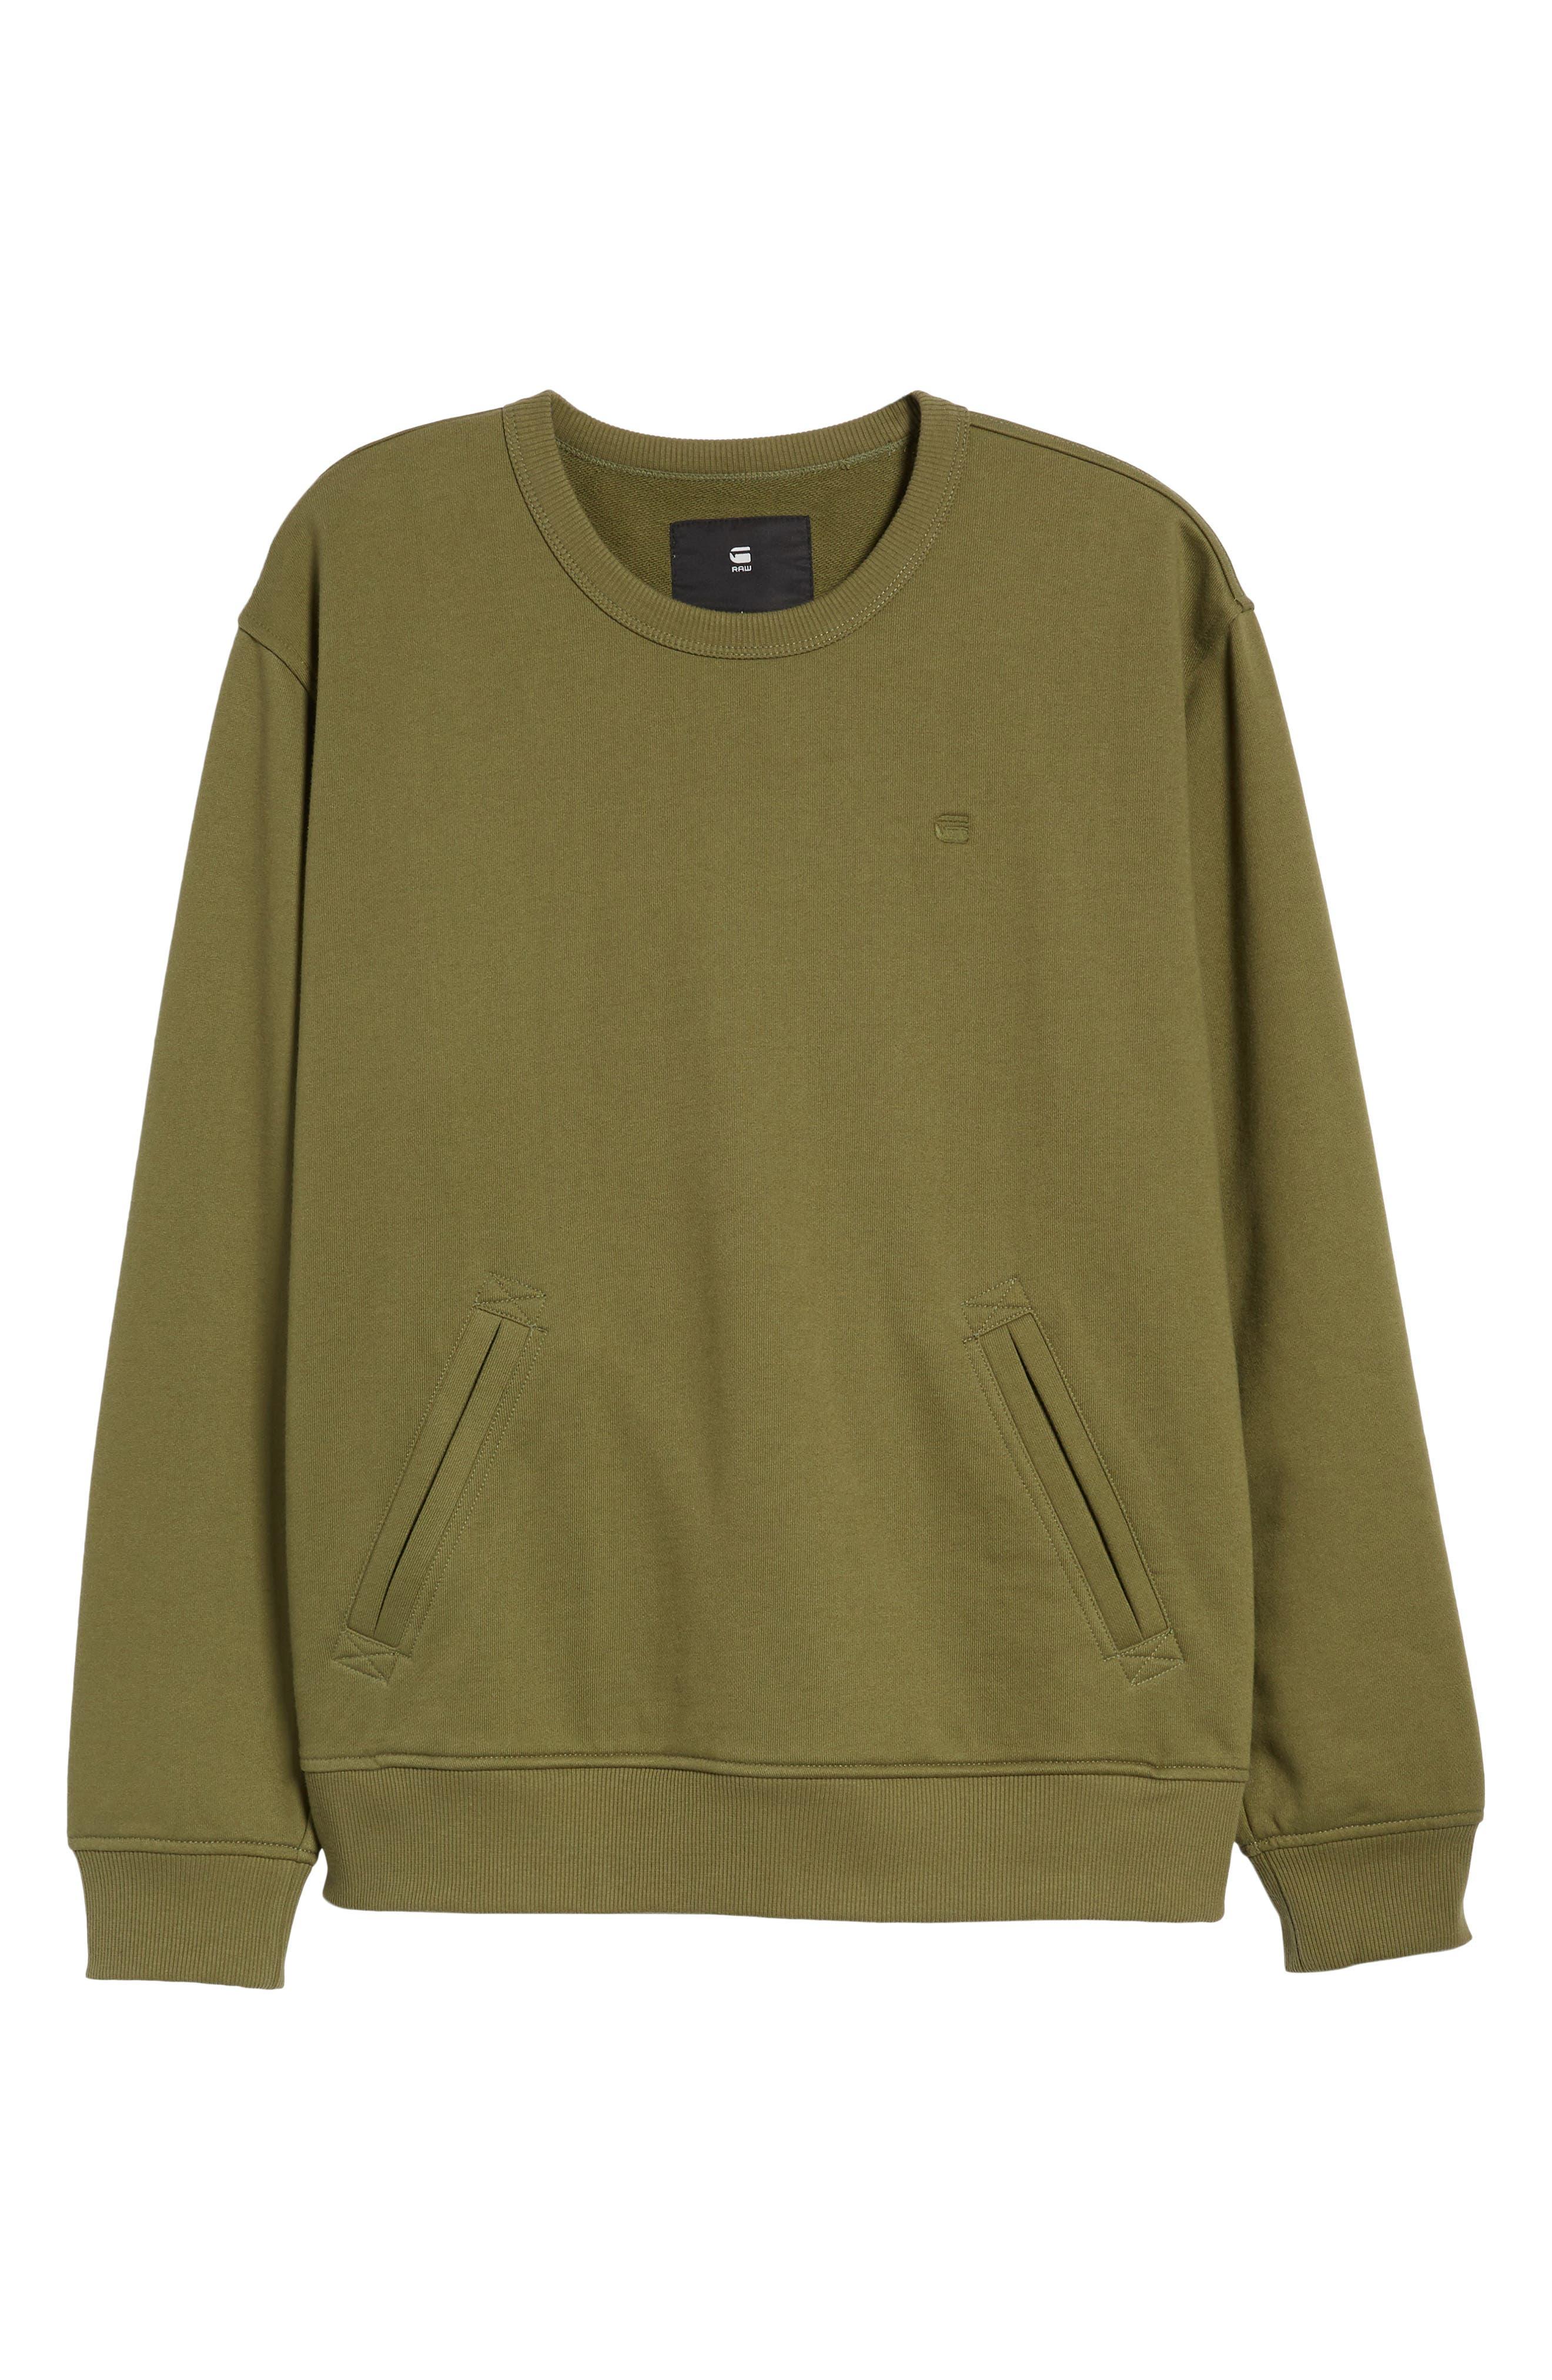 Core Hybrid Archive Sweatshirt,                             Alternate thumbnail 6, color,                             300